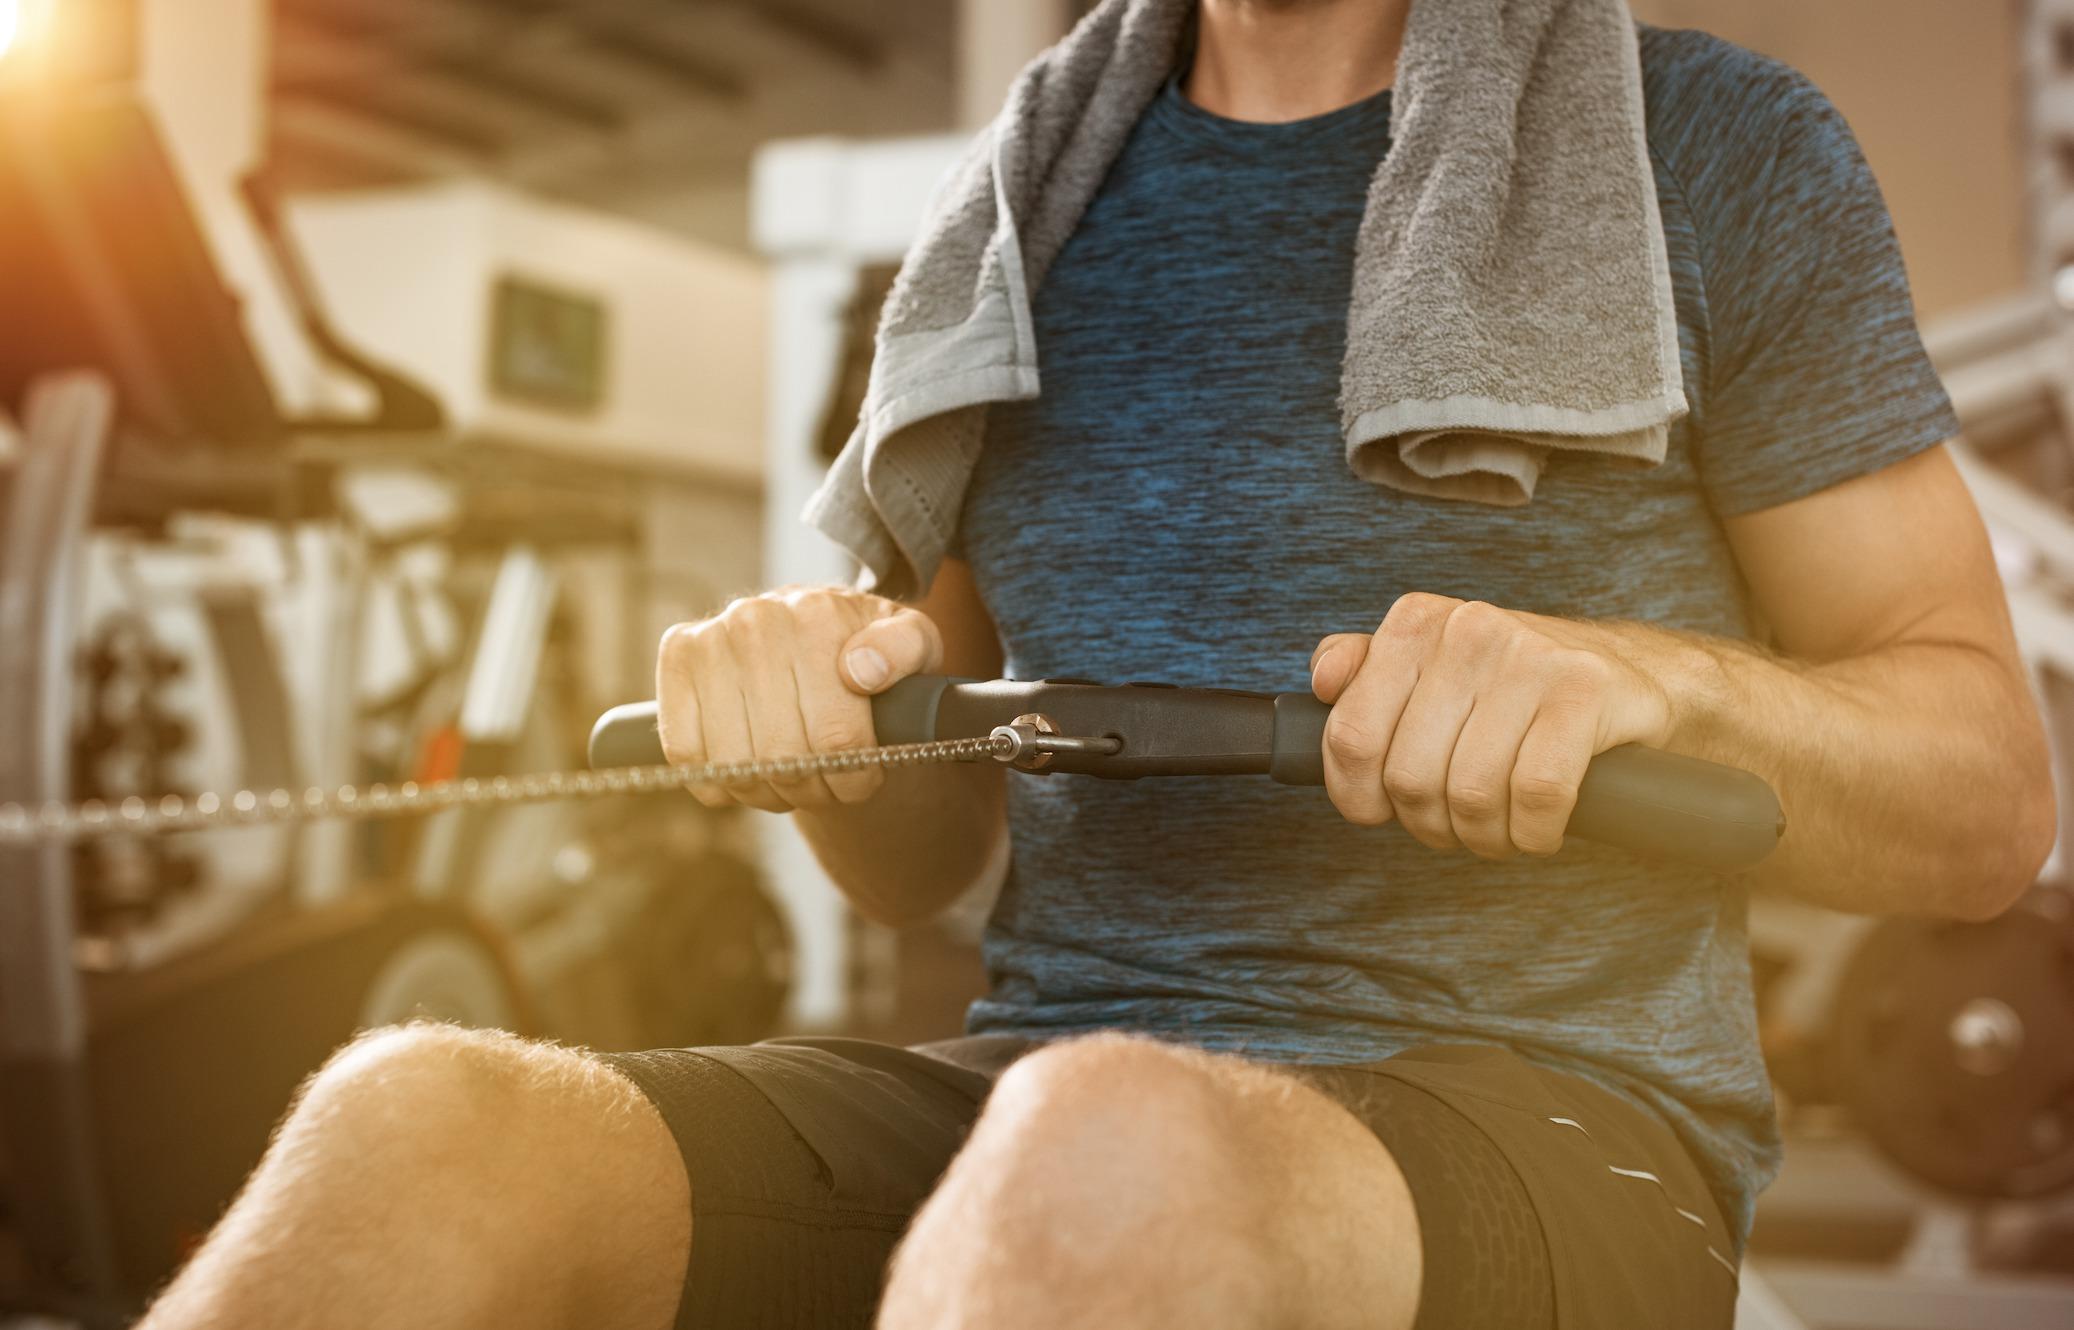 sunny health & fitness phantom rower sf-rw5910 review